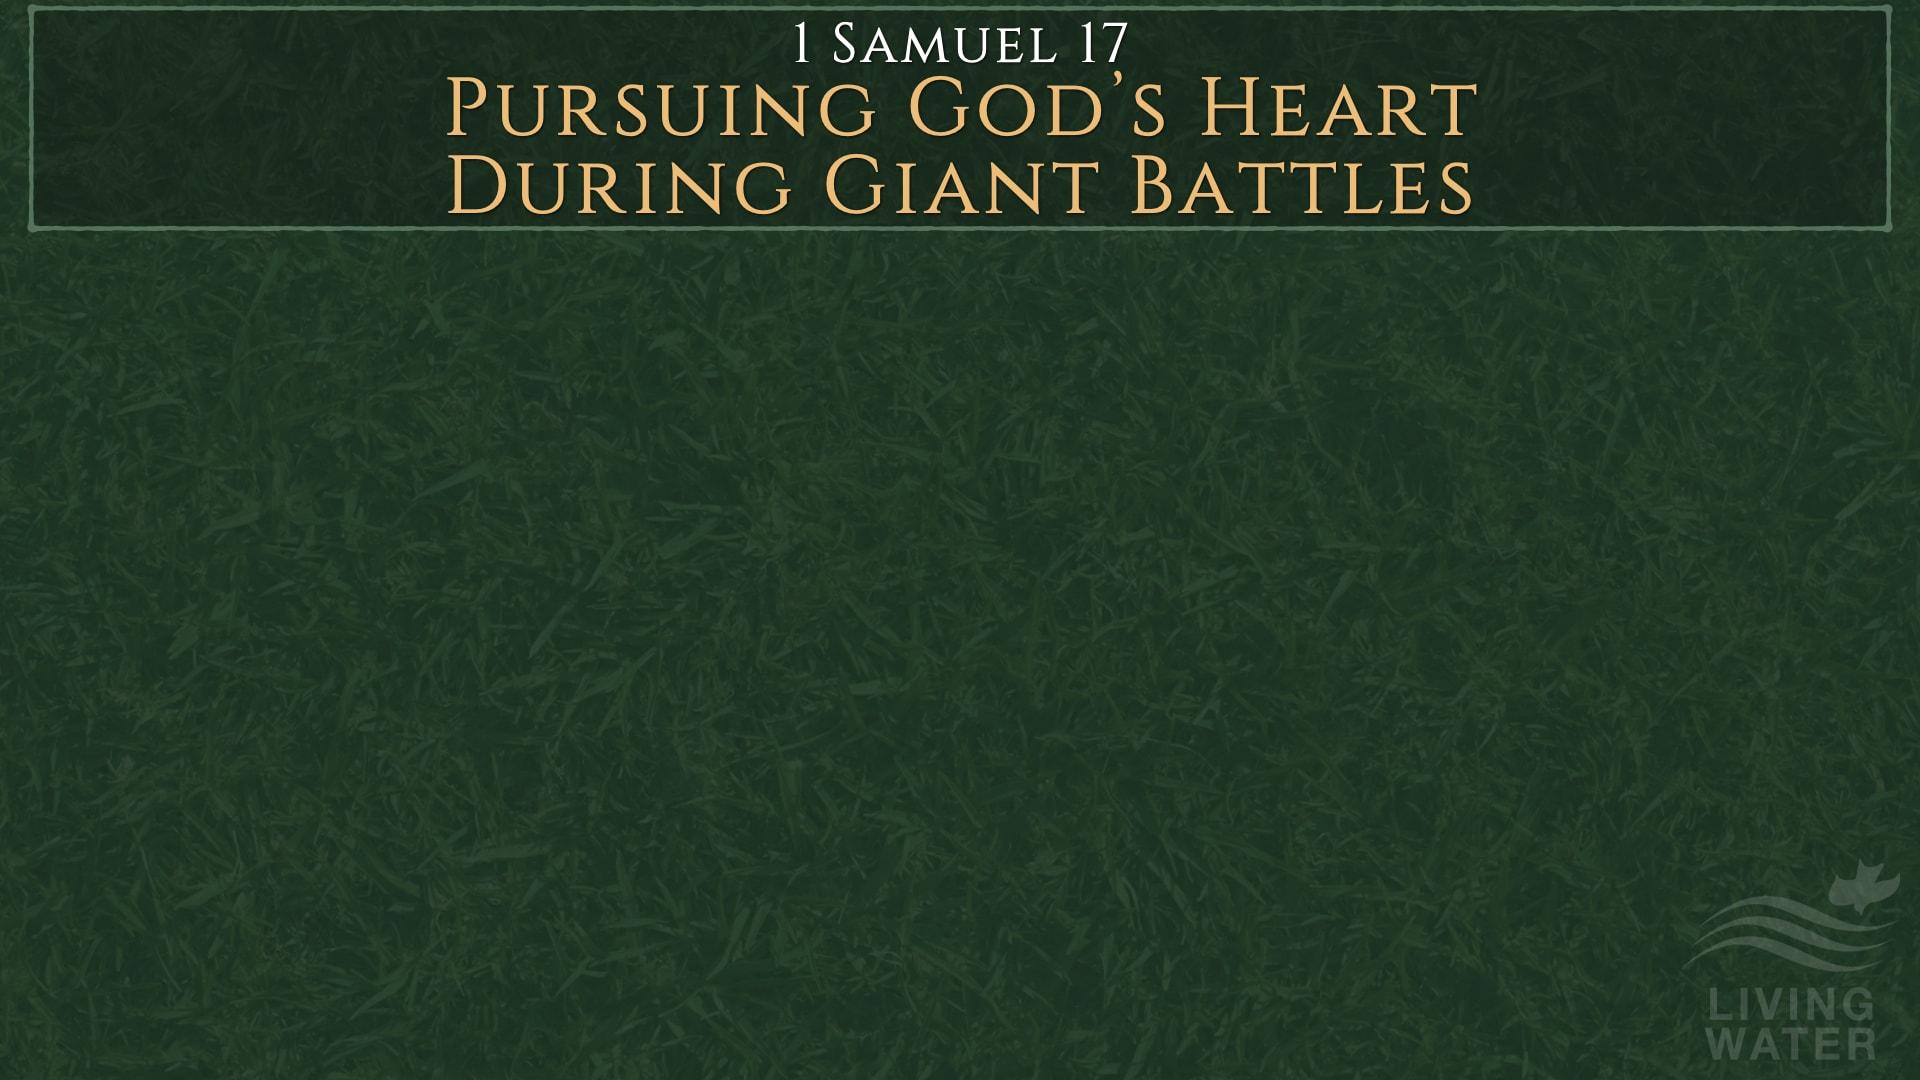 1 Samuel 17, Pursuing God's Heart During Giant Battles